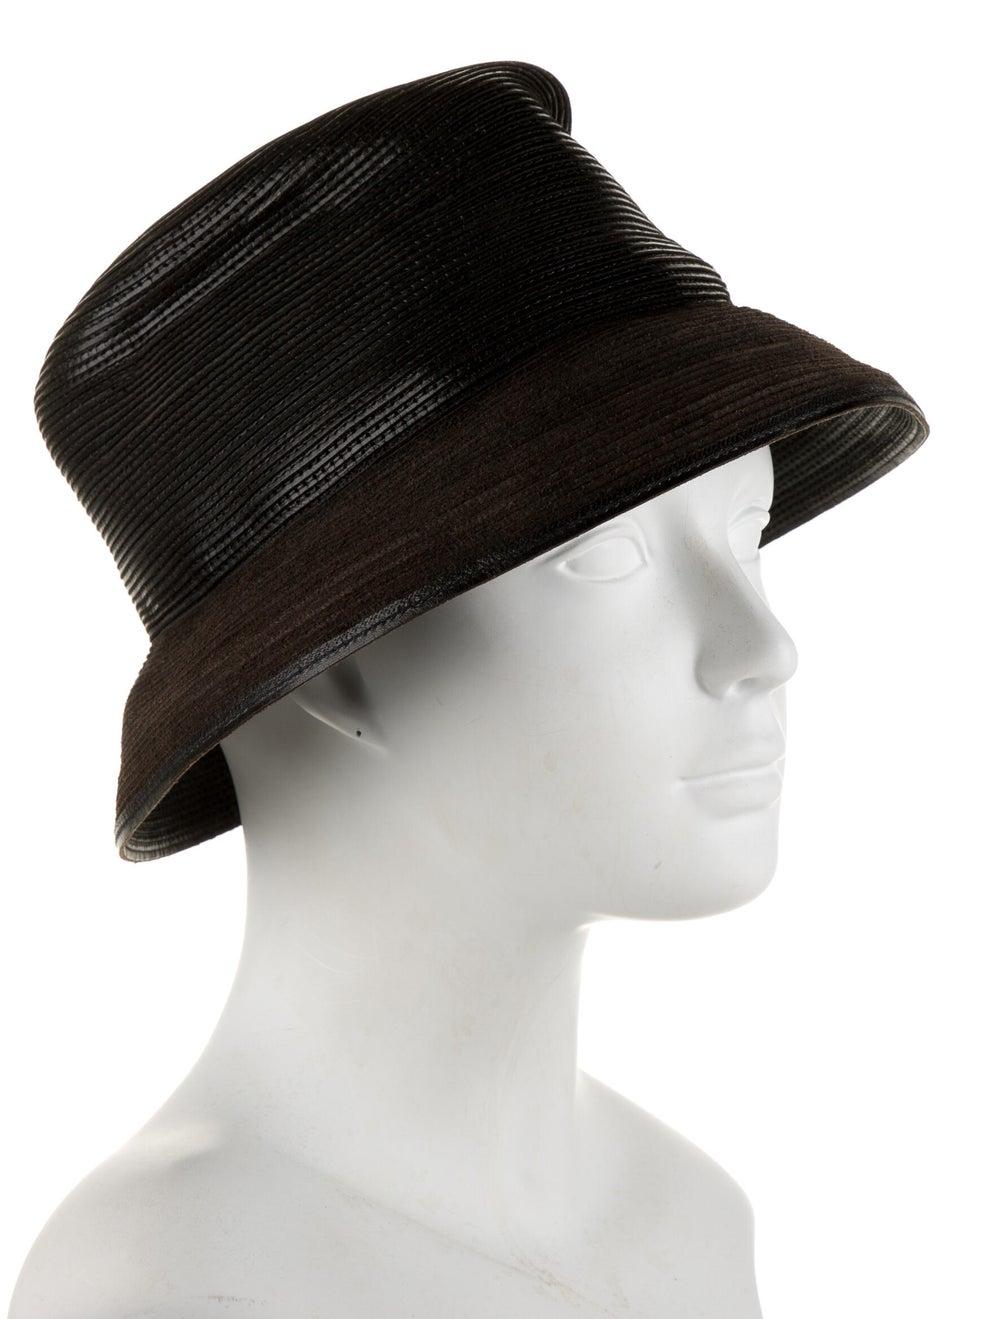 Patricia Underwood Leather Brim Hat Brown - image 3